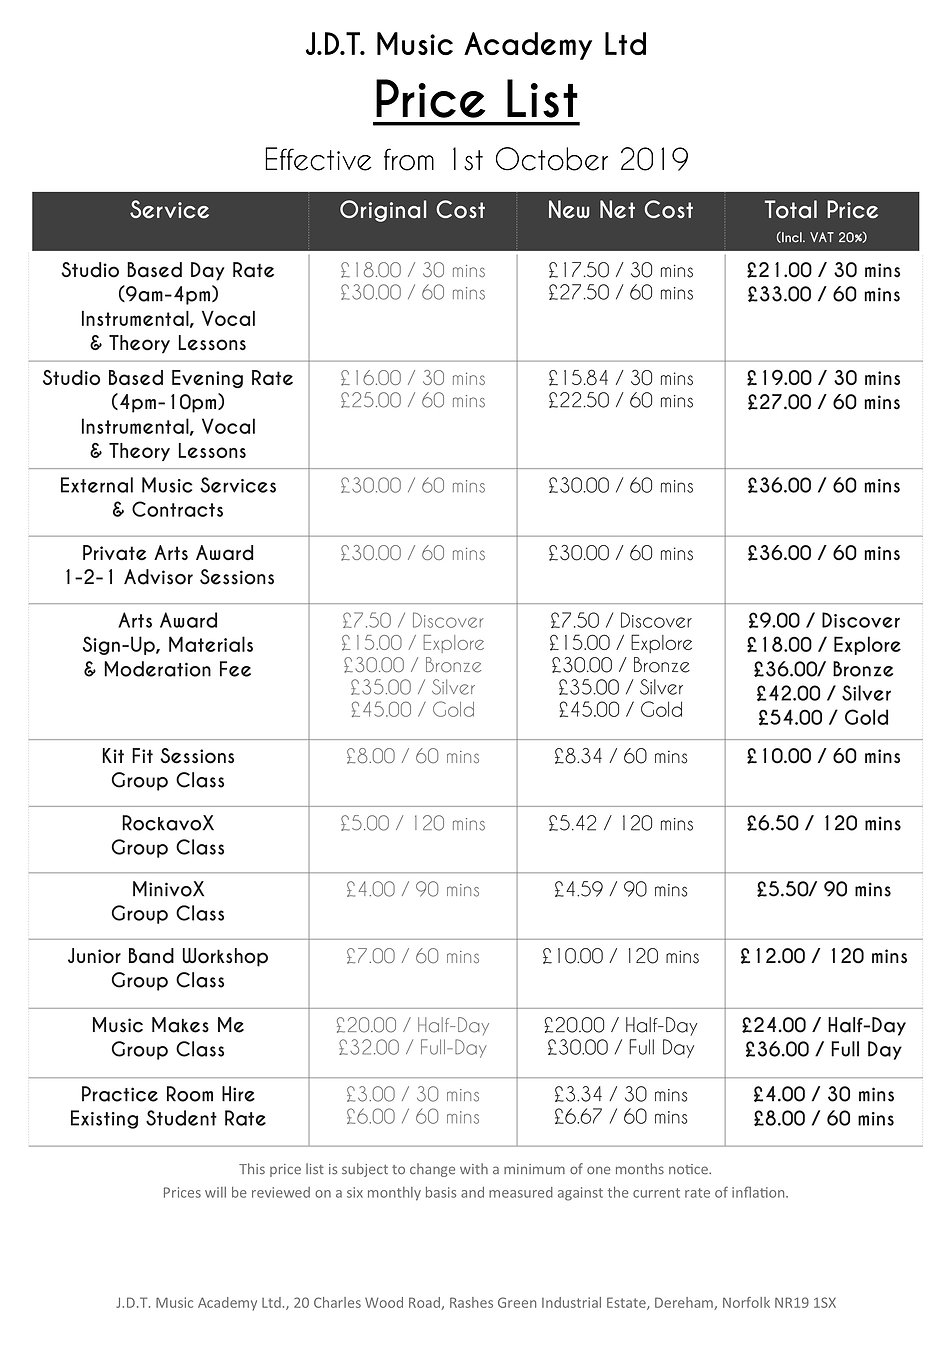 Oct 2019 Price List.jpg